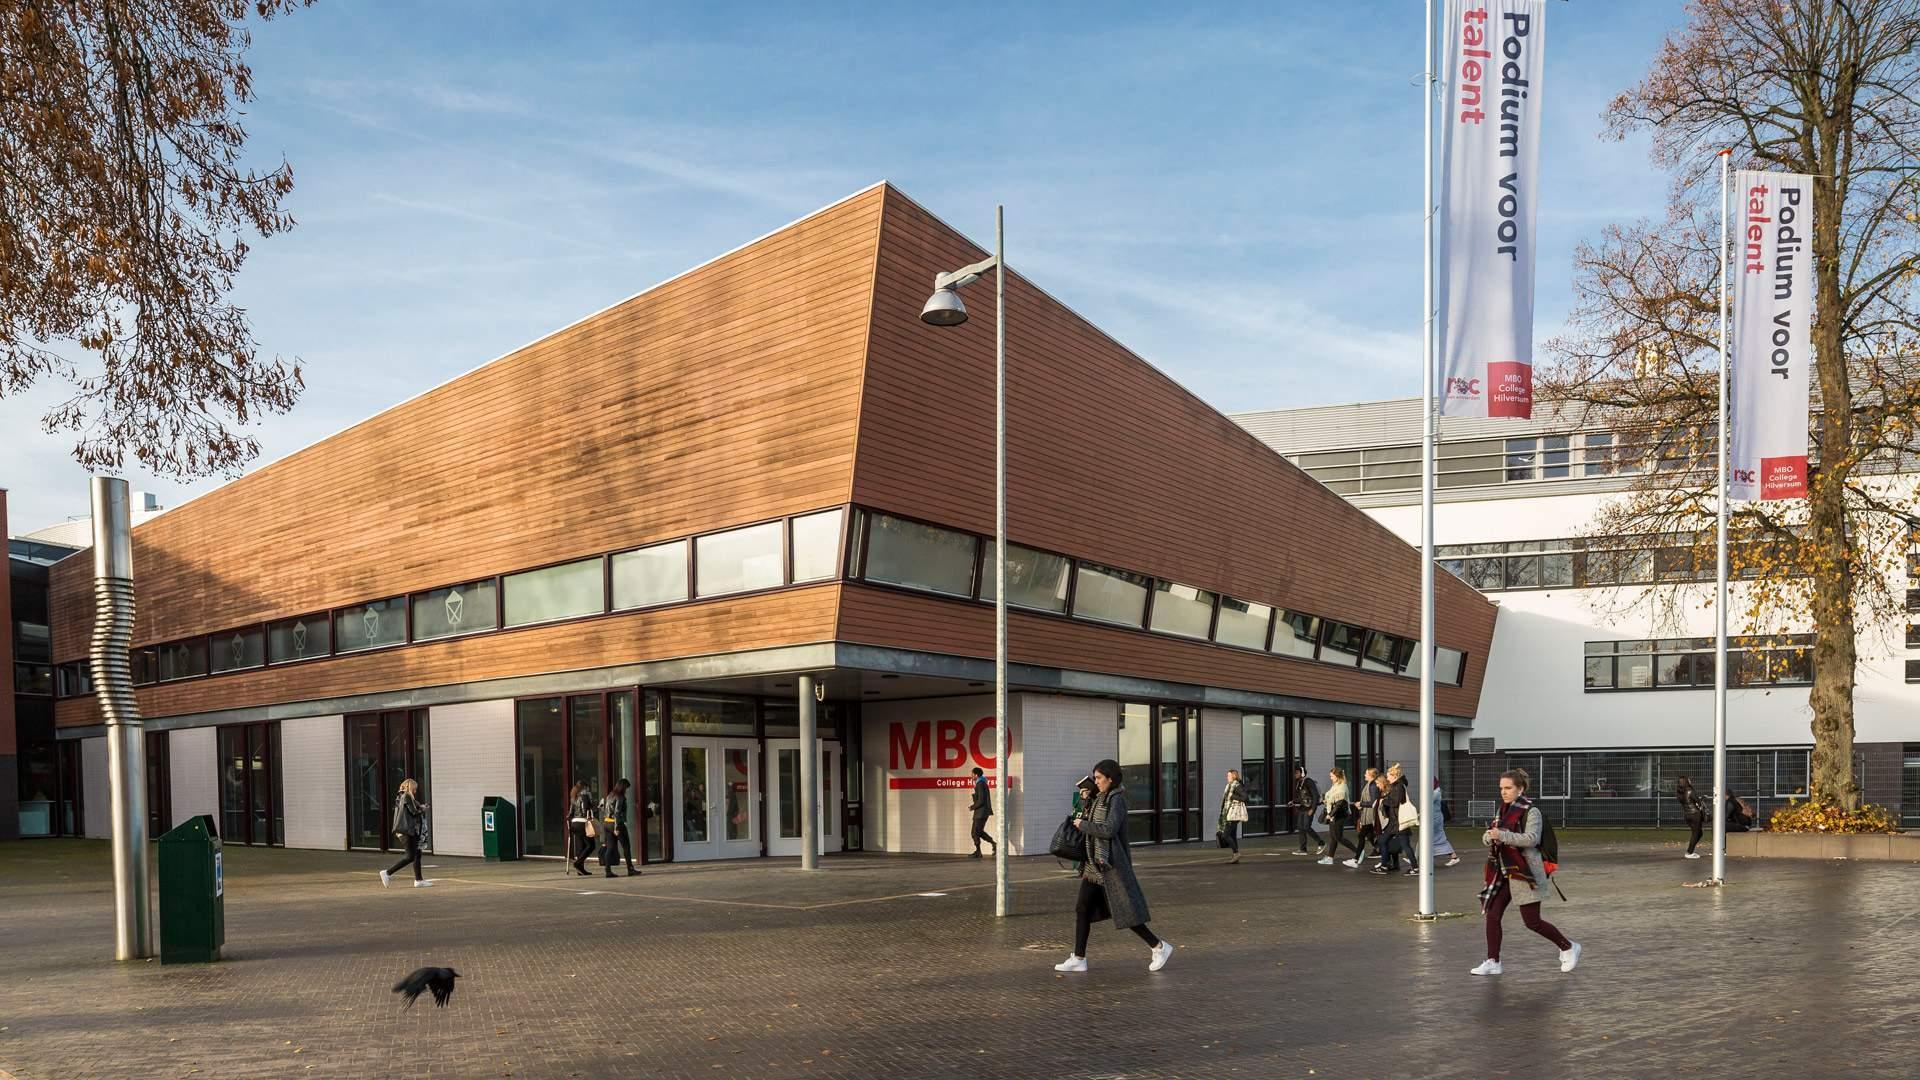 MBO College Hilversum heeft 'Europese primeur' met nieuwe opleiding Esports, Game & Event Manager